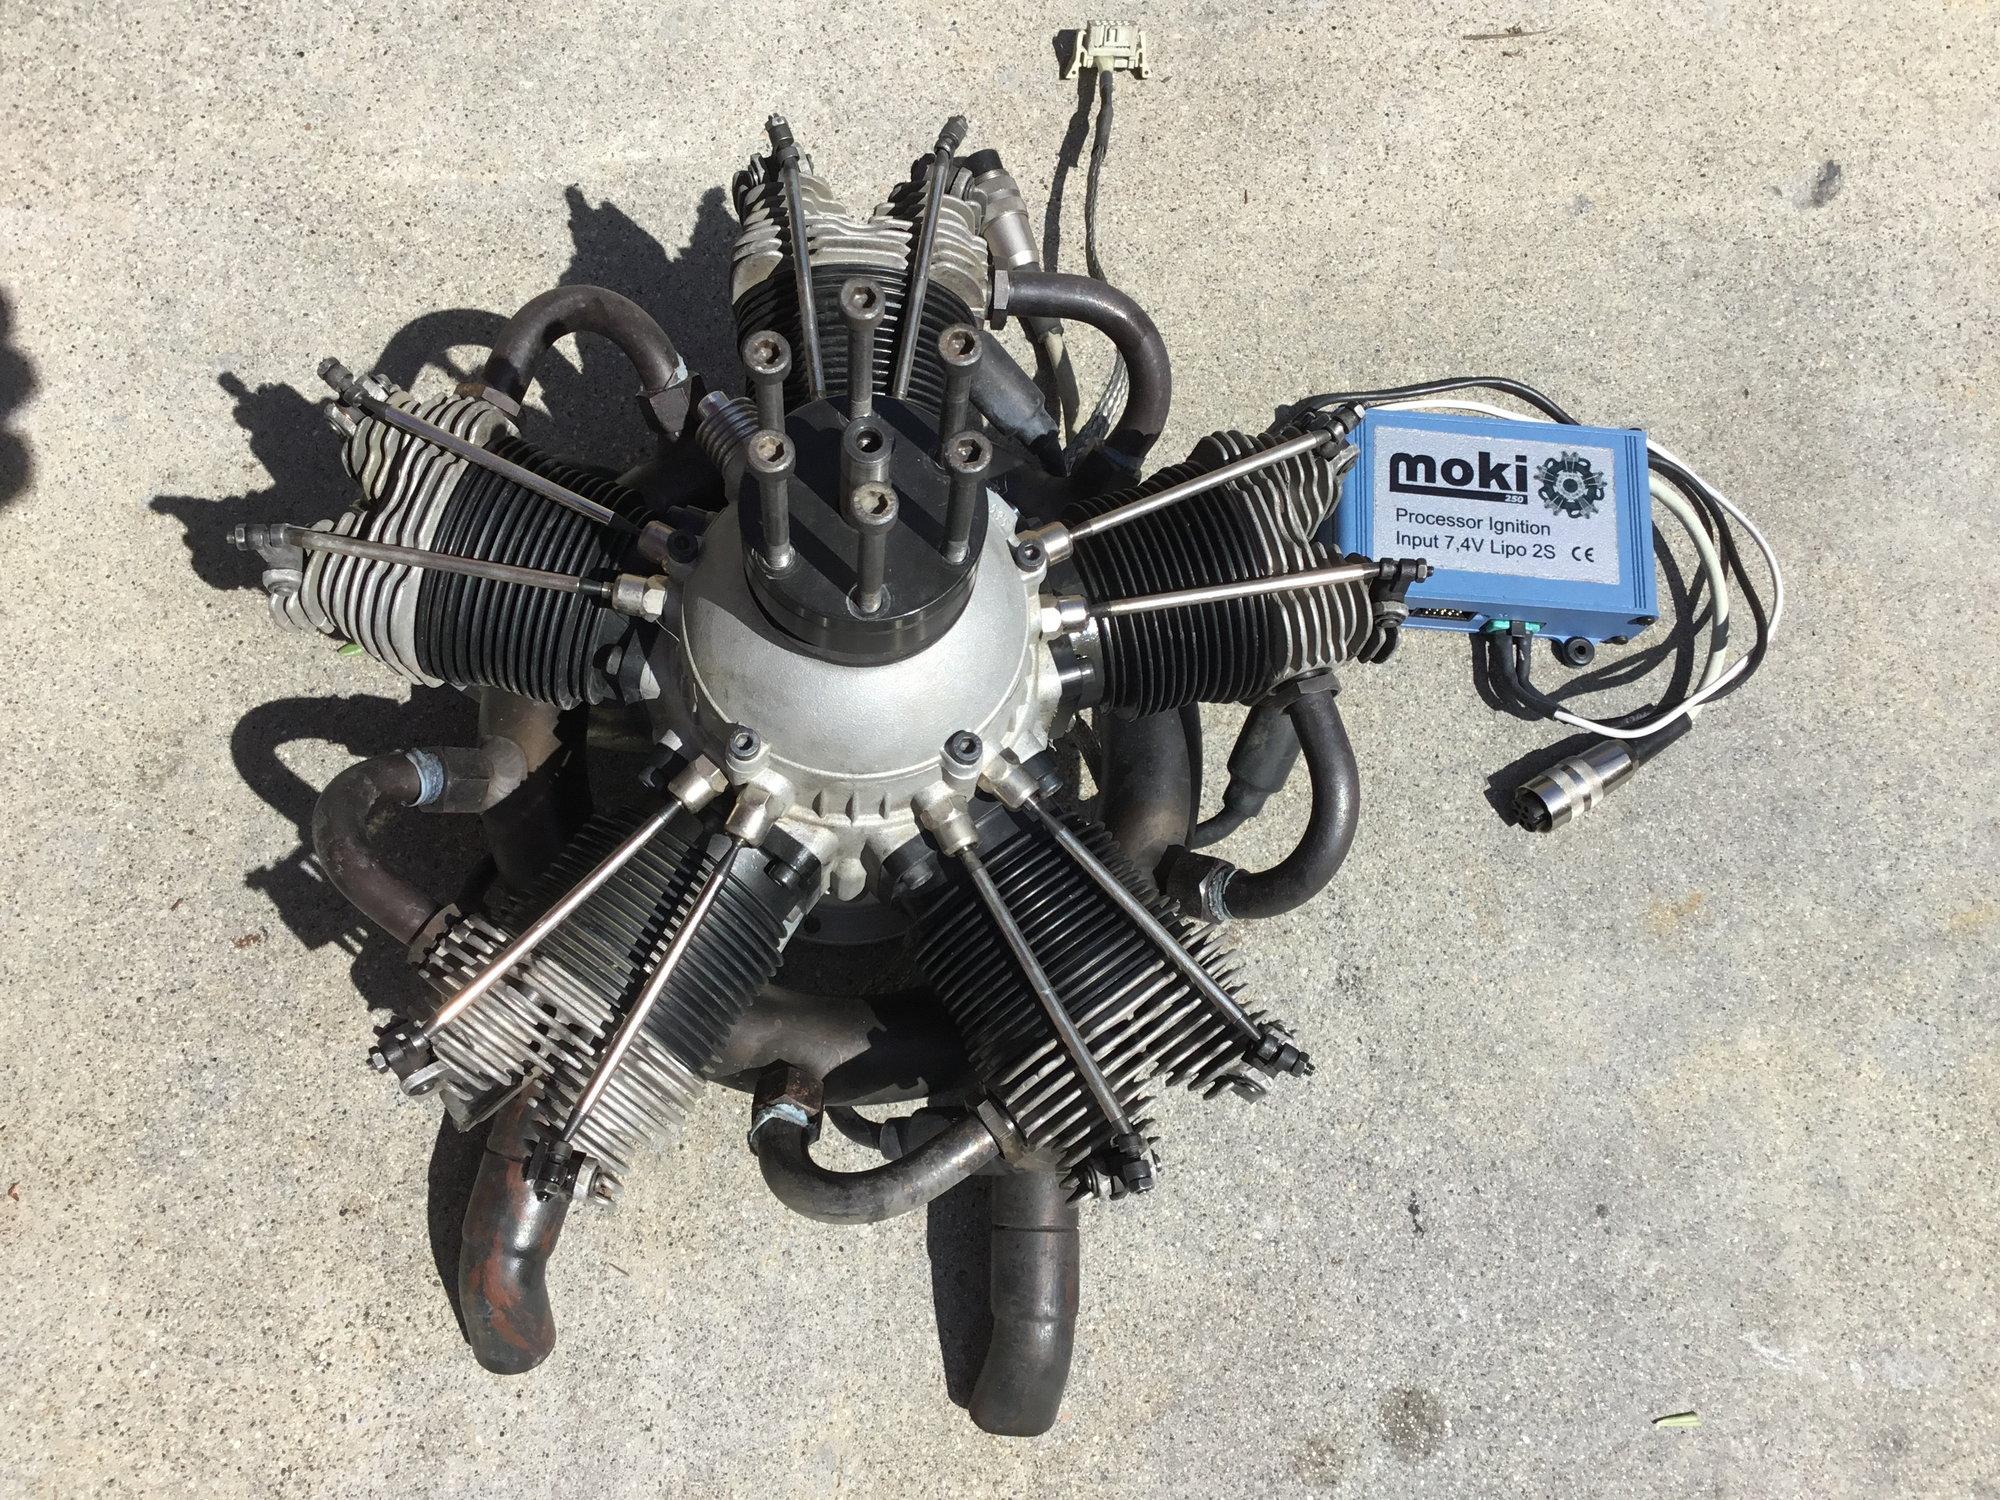 Moki 215 5-Cylinder Radial Engine w/ Updated Blue Box